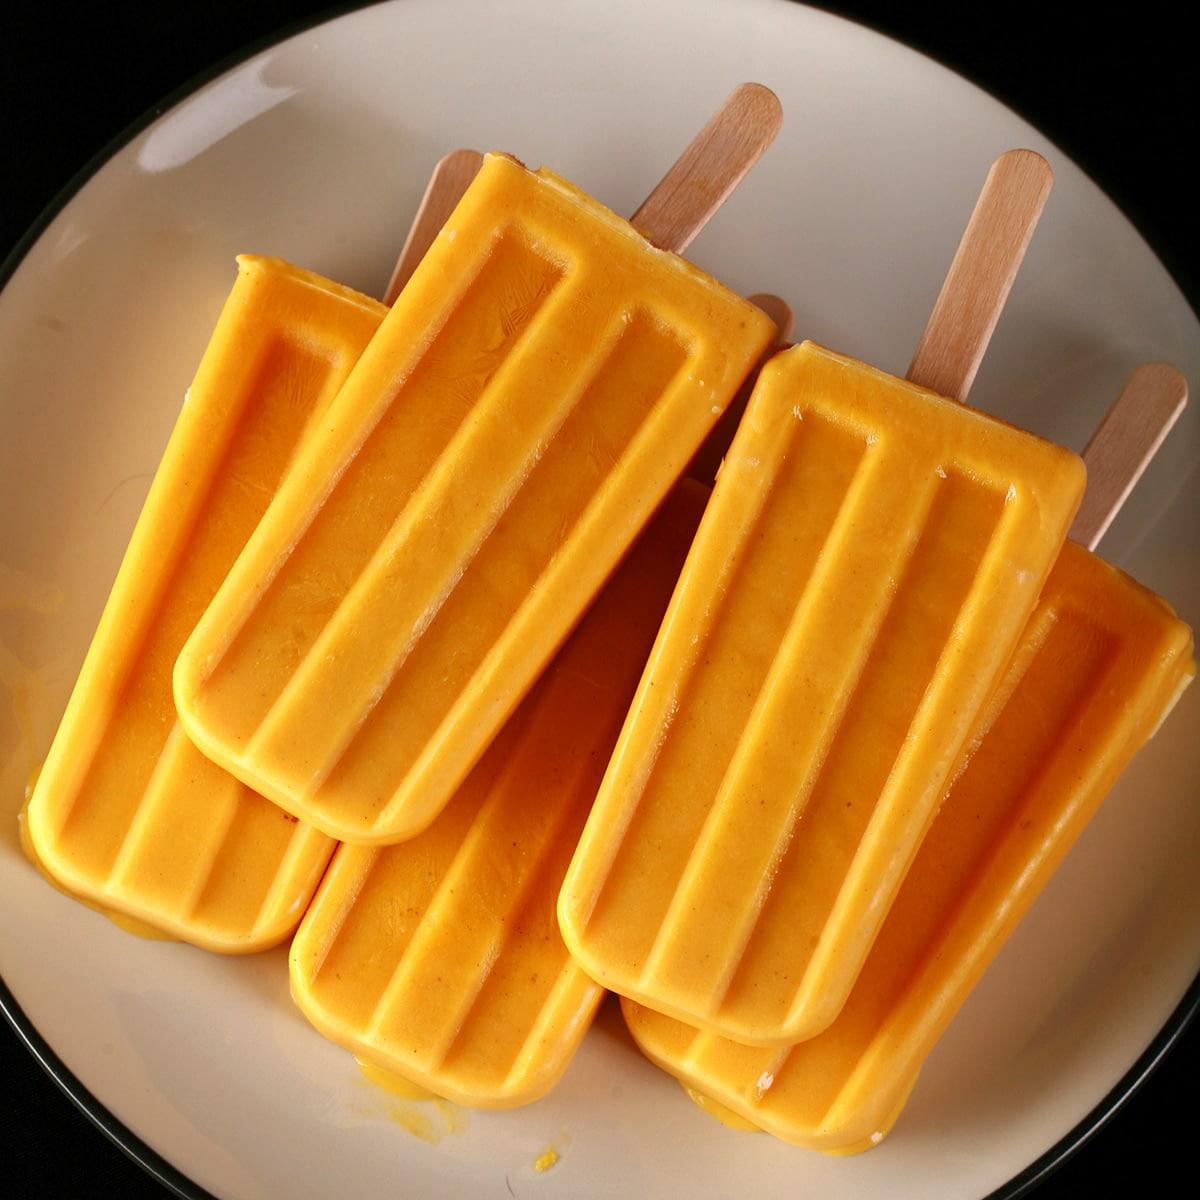 Several deep orange-yellow Mango Lassi Popsicles on a white plate.